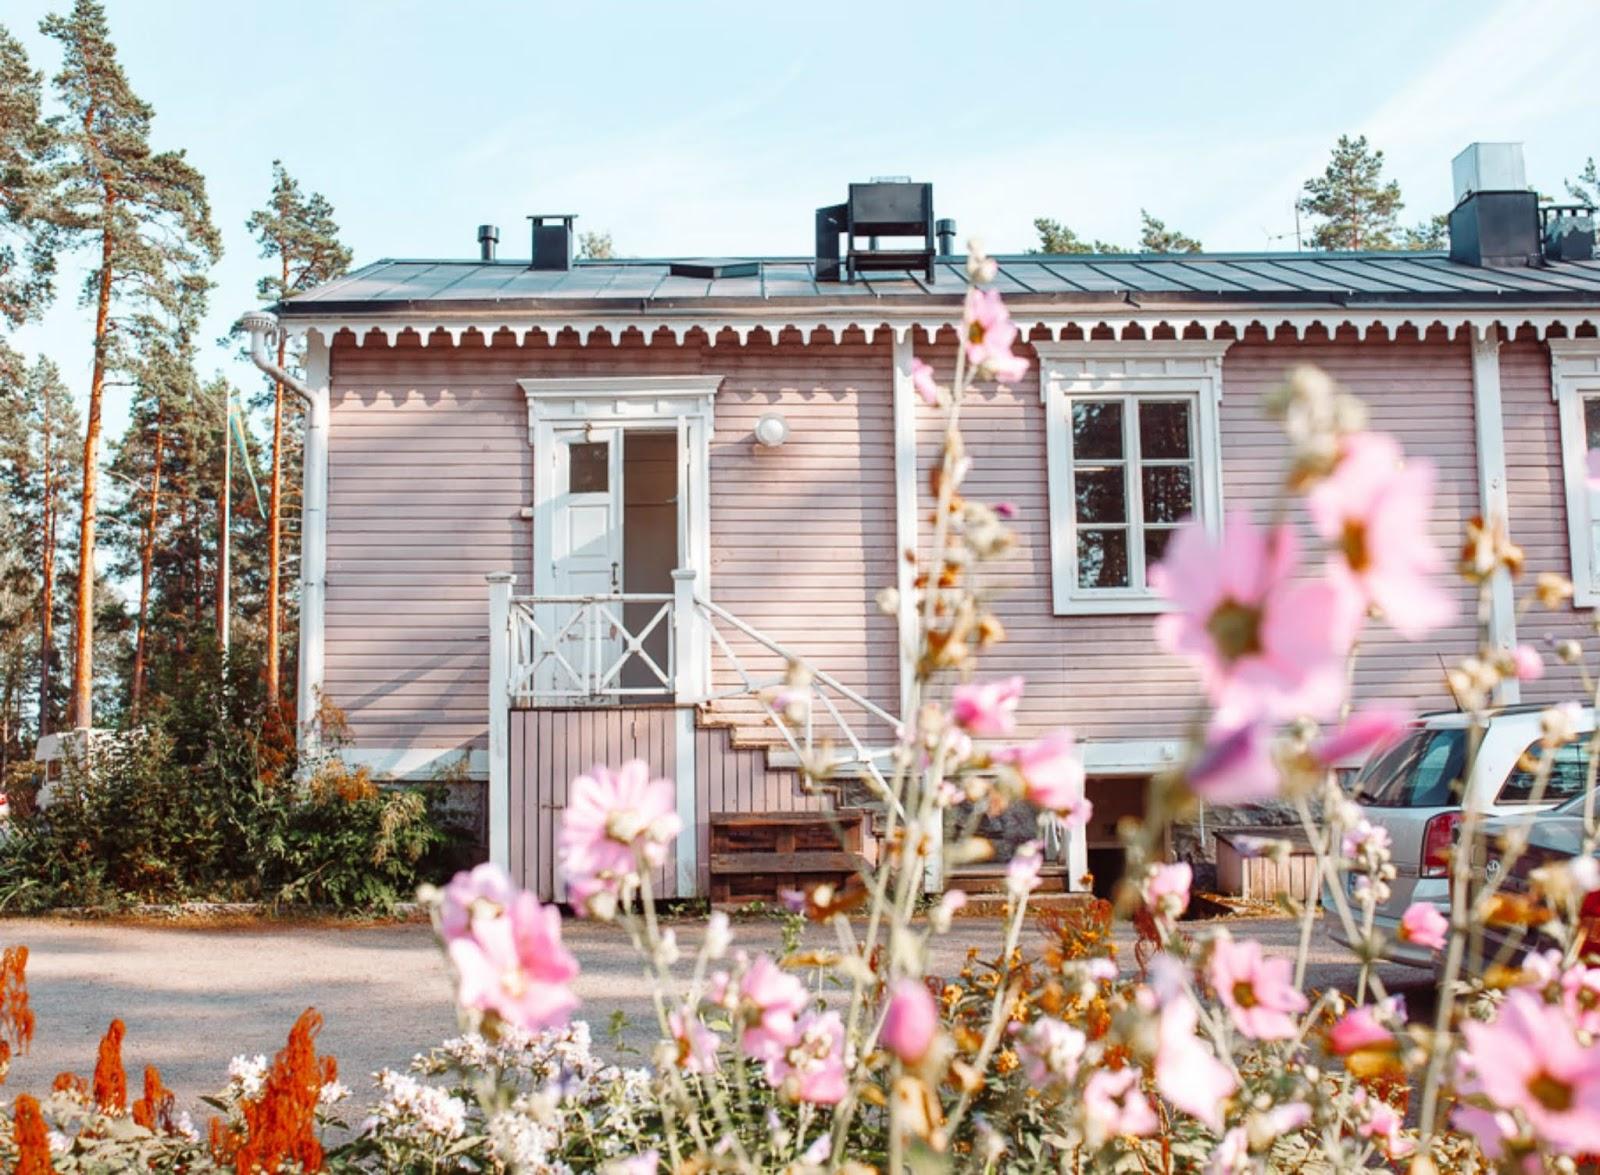 Hotel Punkaharju Finland